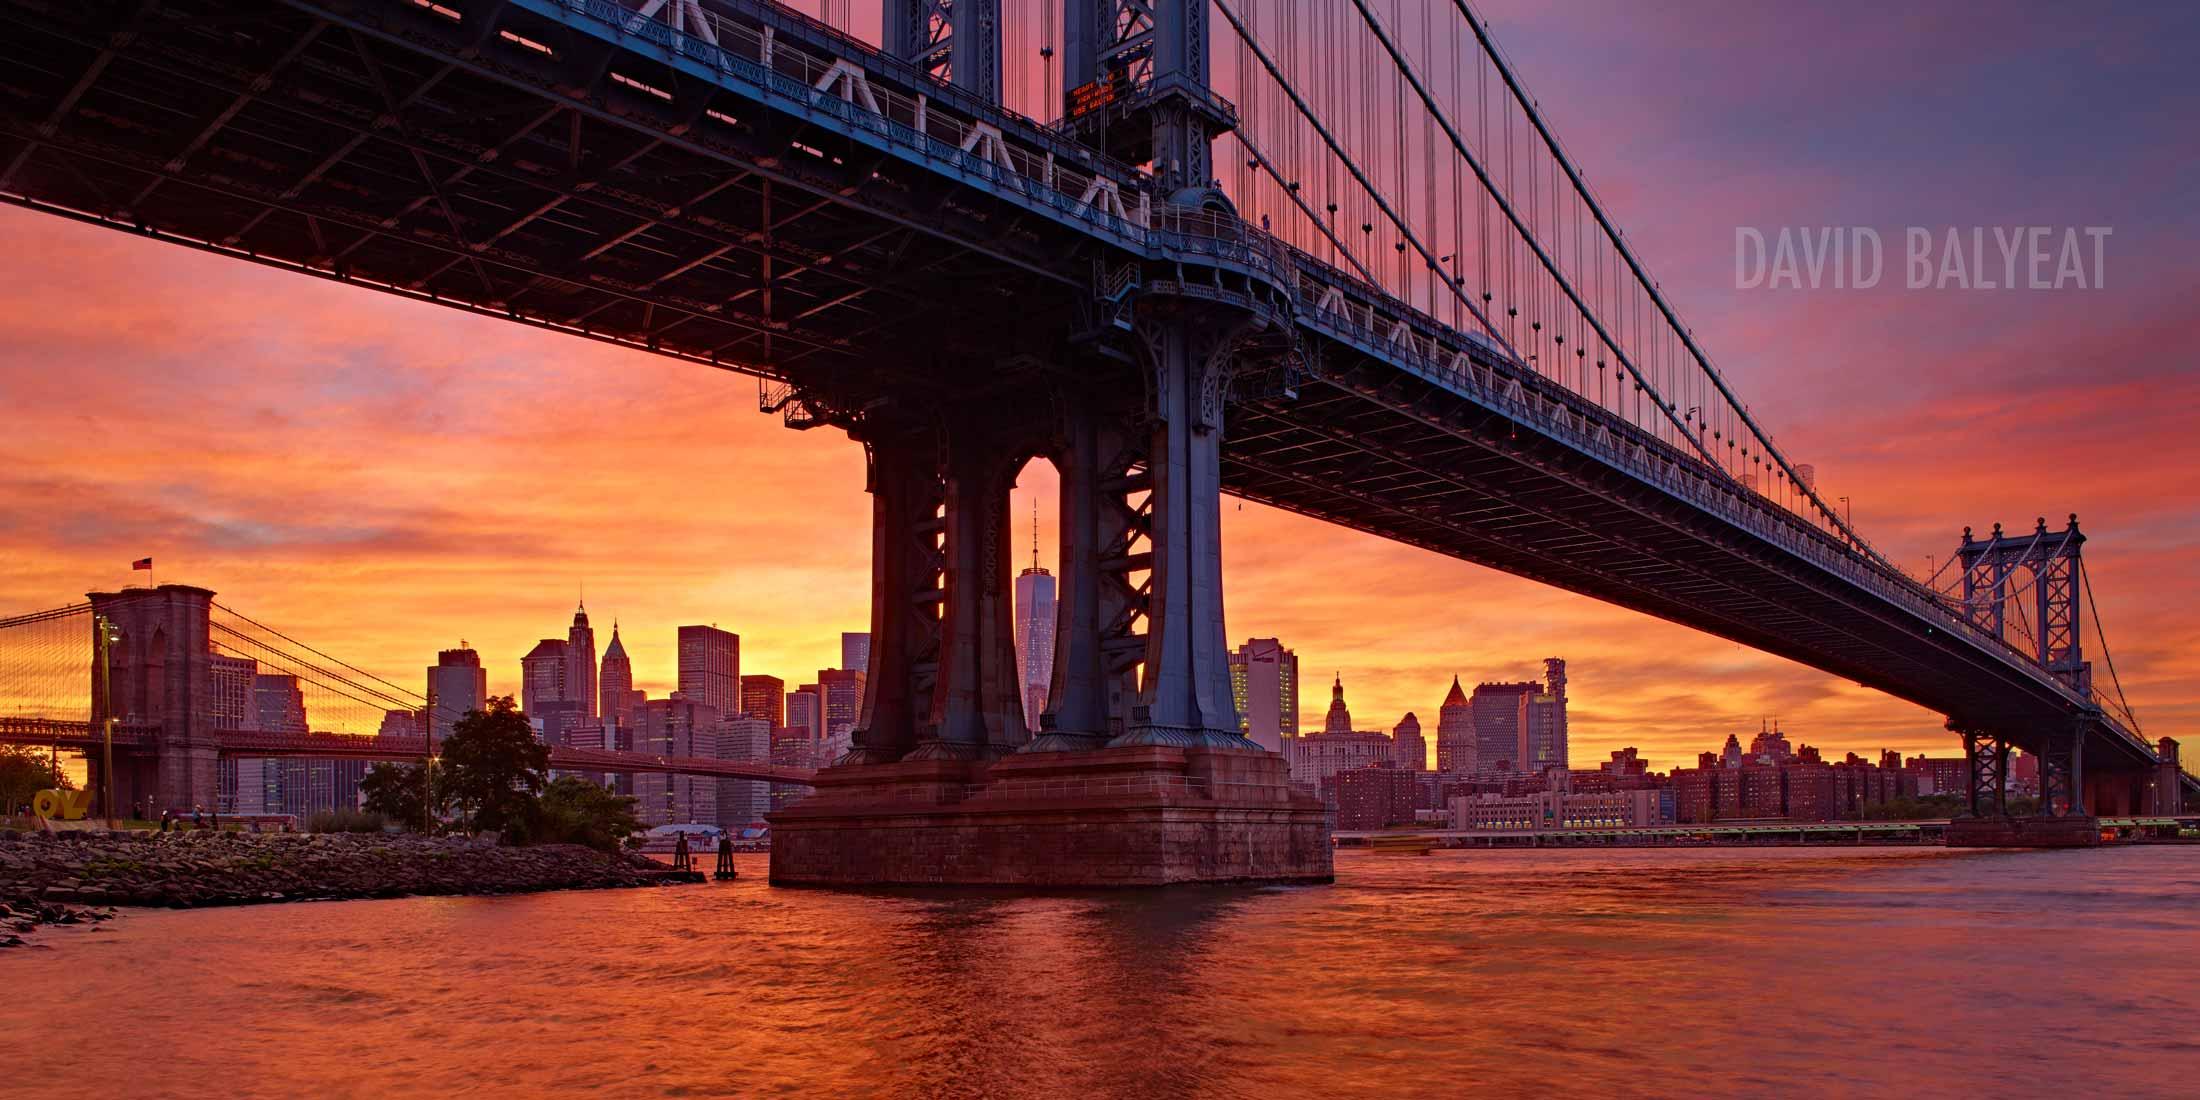 Seattle Washington Fall Skyline Wallpaper Manhattan Bridge New York City David Balyeat